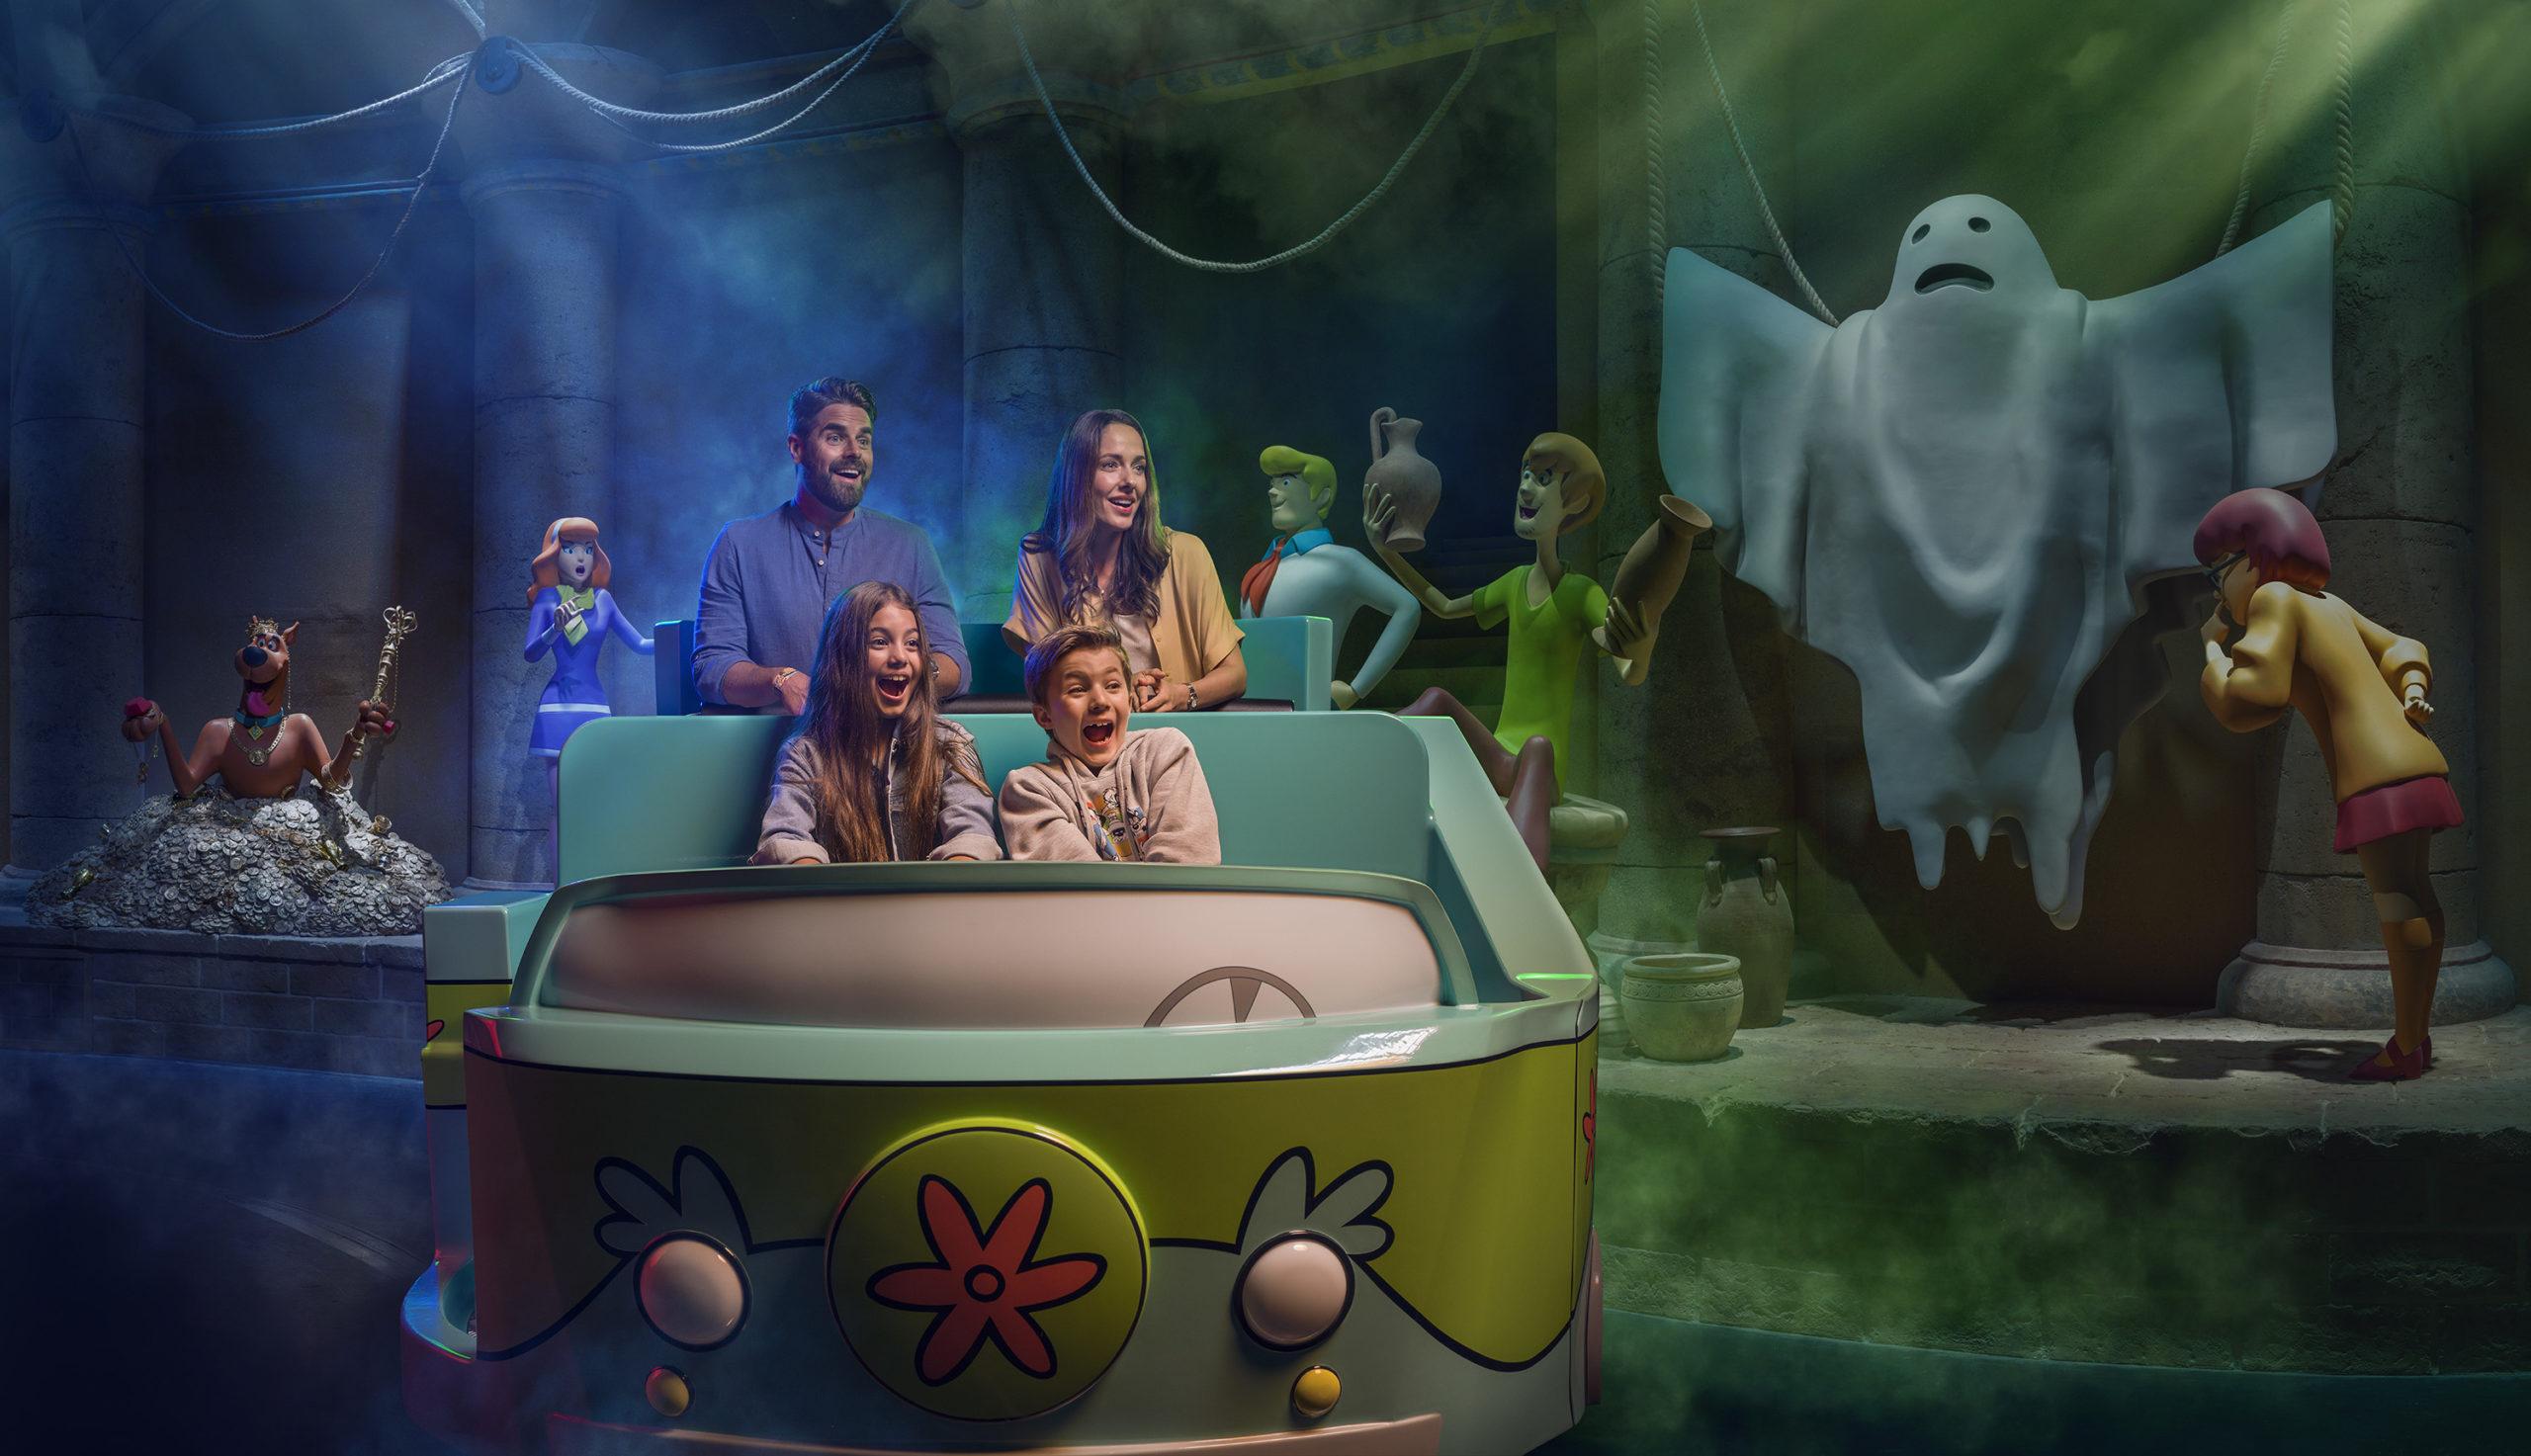 Scooby Doo Ride Warner Bros. Parks Abu Dhabi